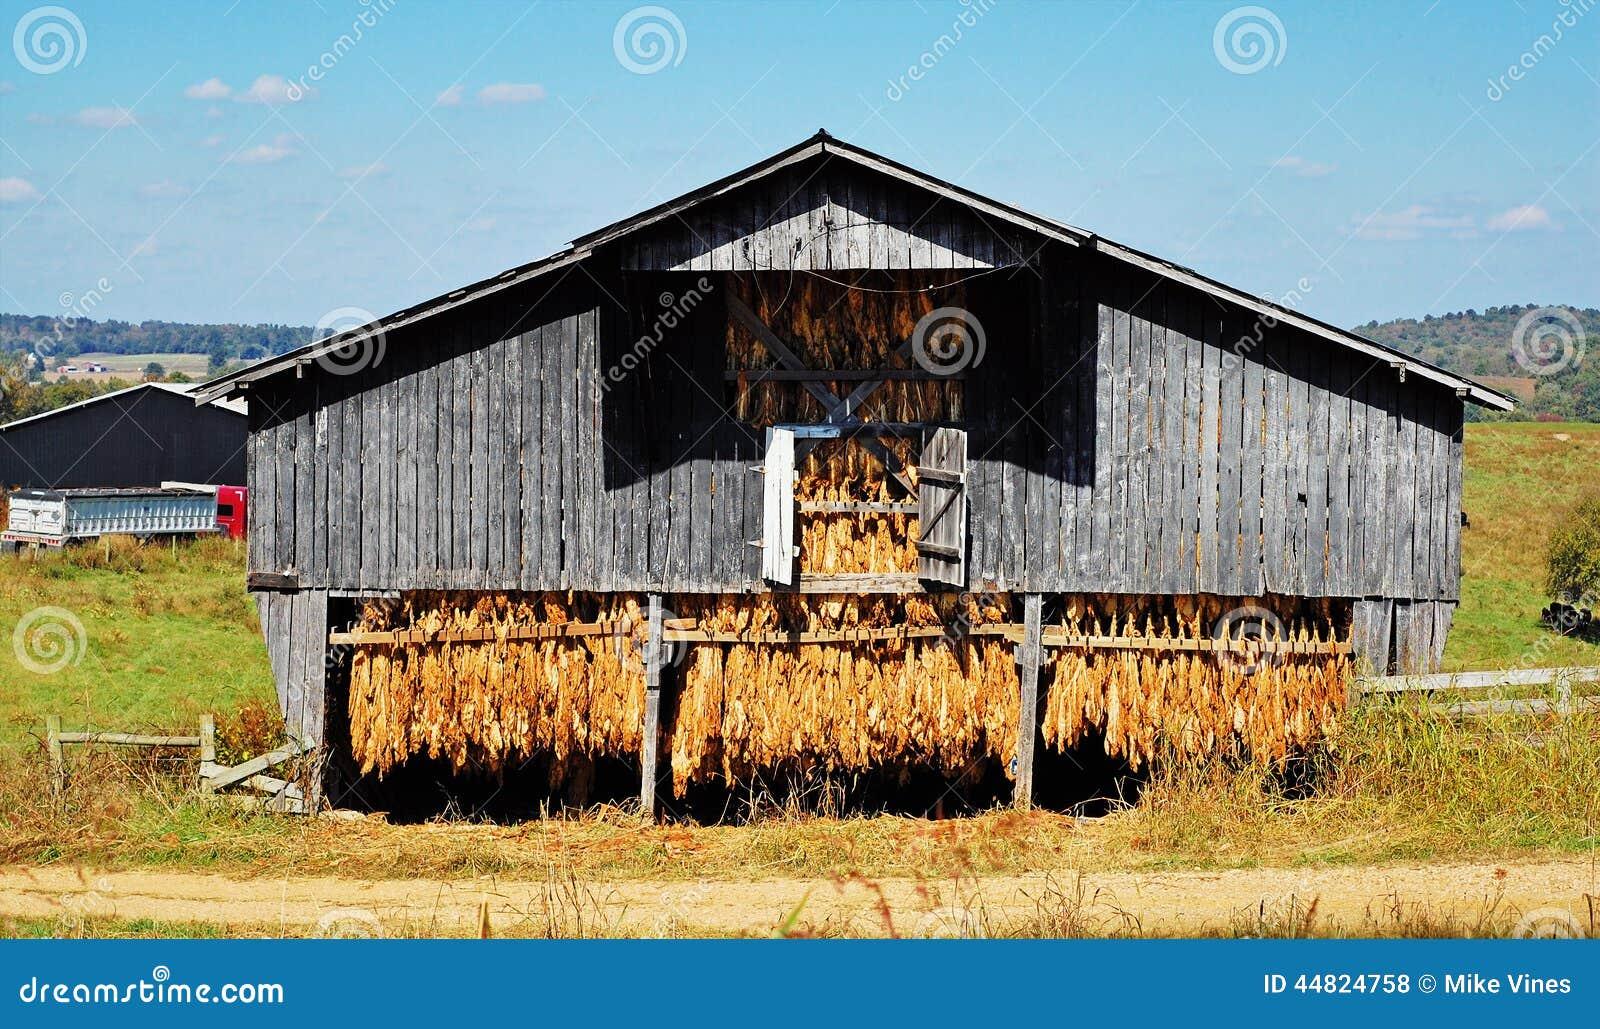 Old Tobacco Barn Stock Photo Image 44824758